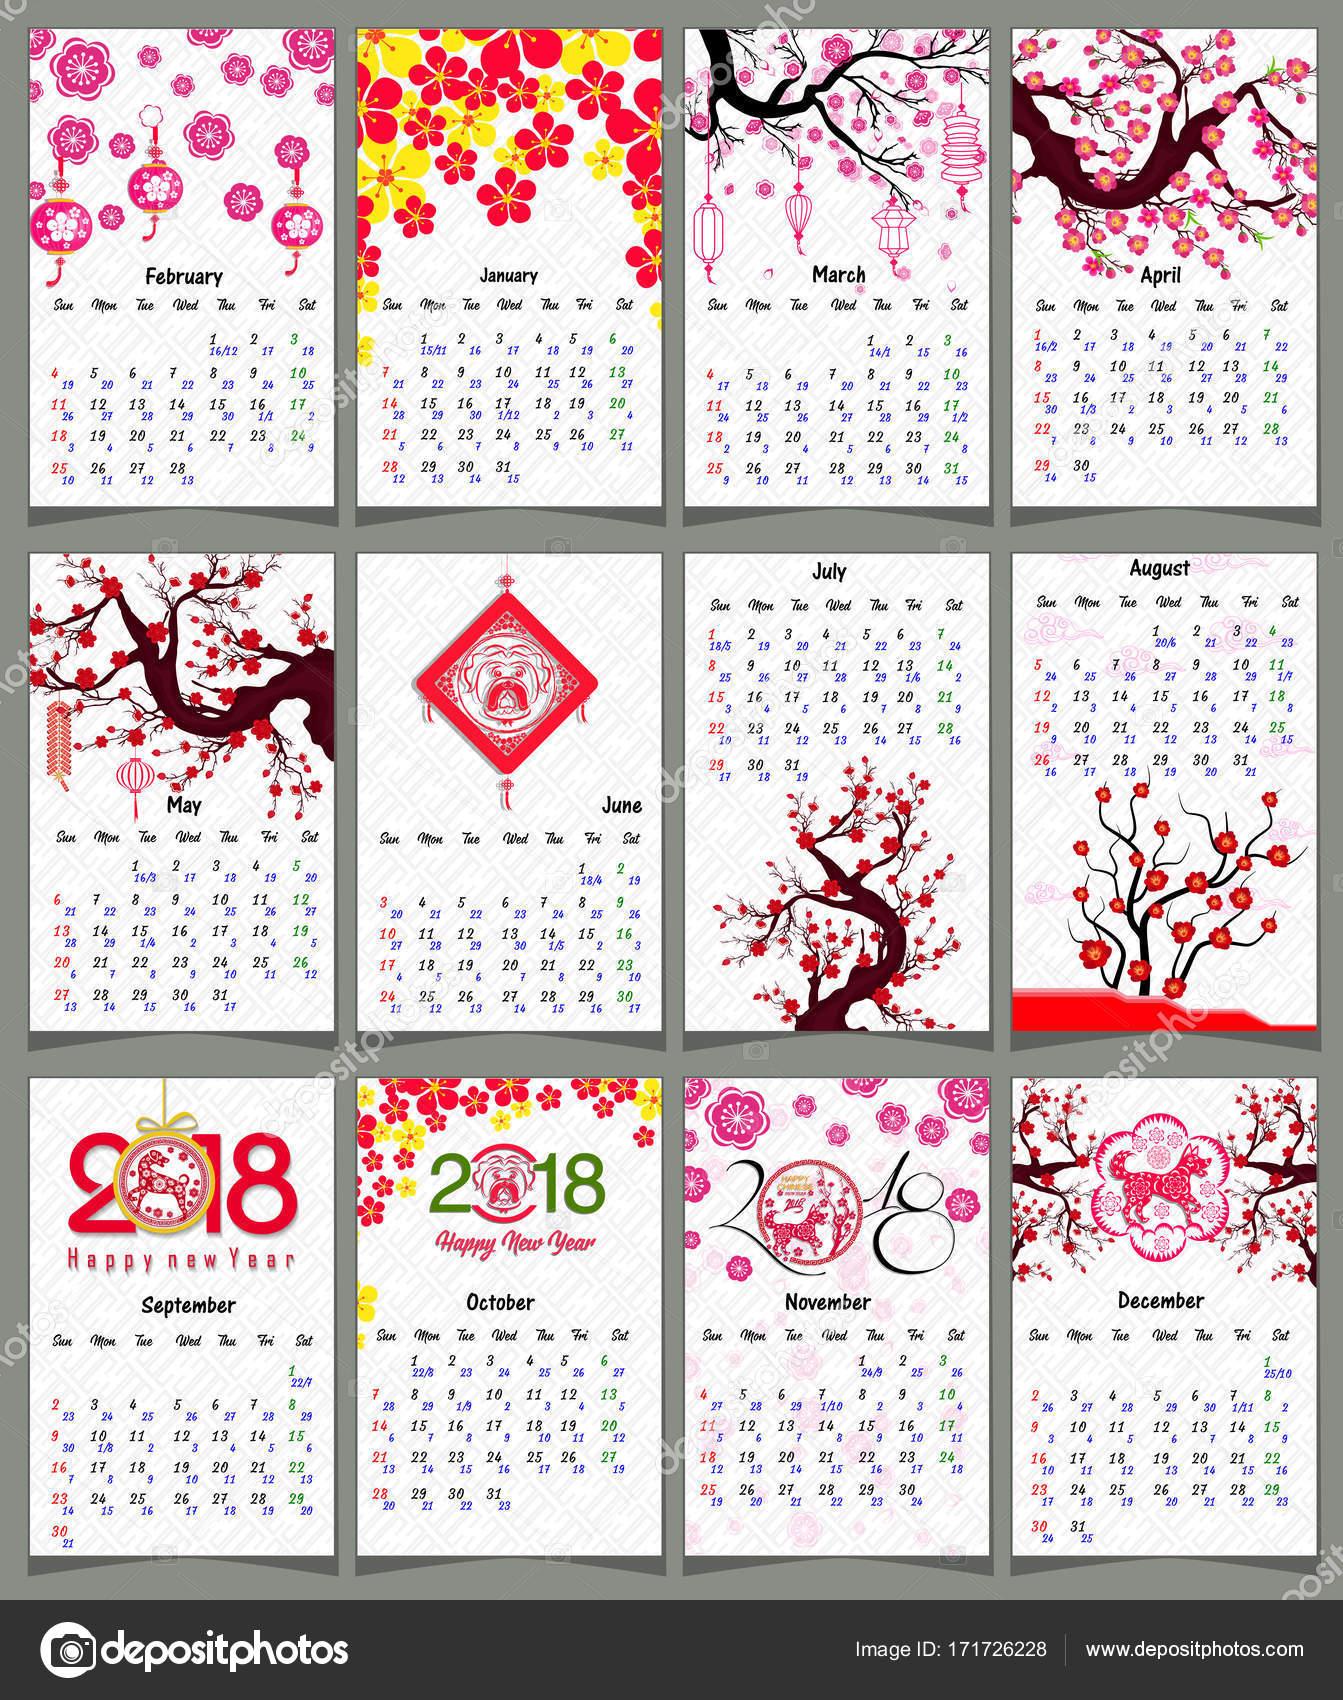 Calendario Chino.Calendario Lunar Calendario Chino Para El Ano 2018 Del